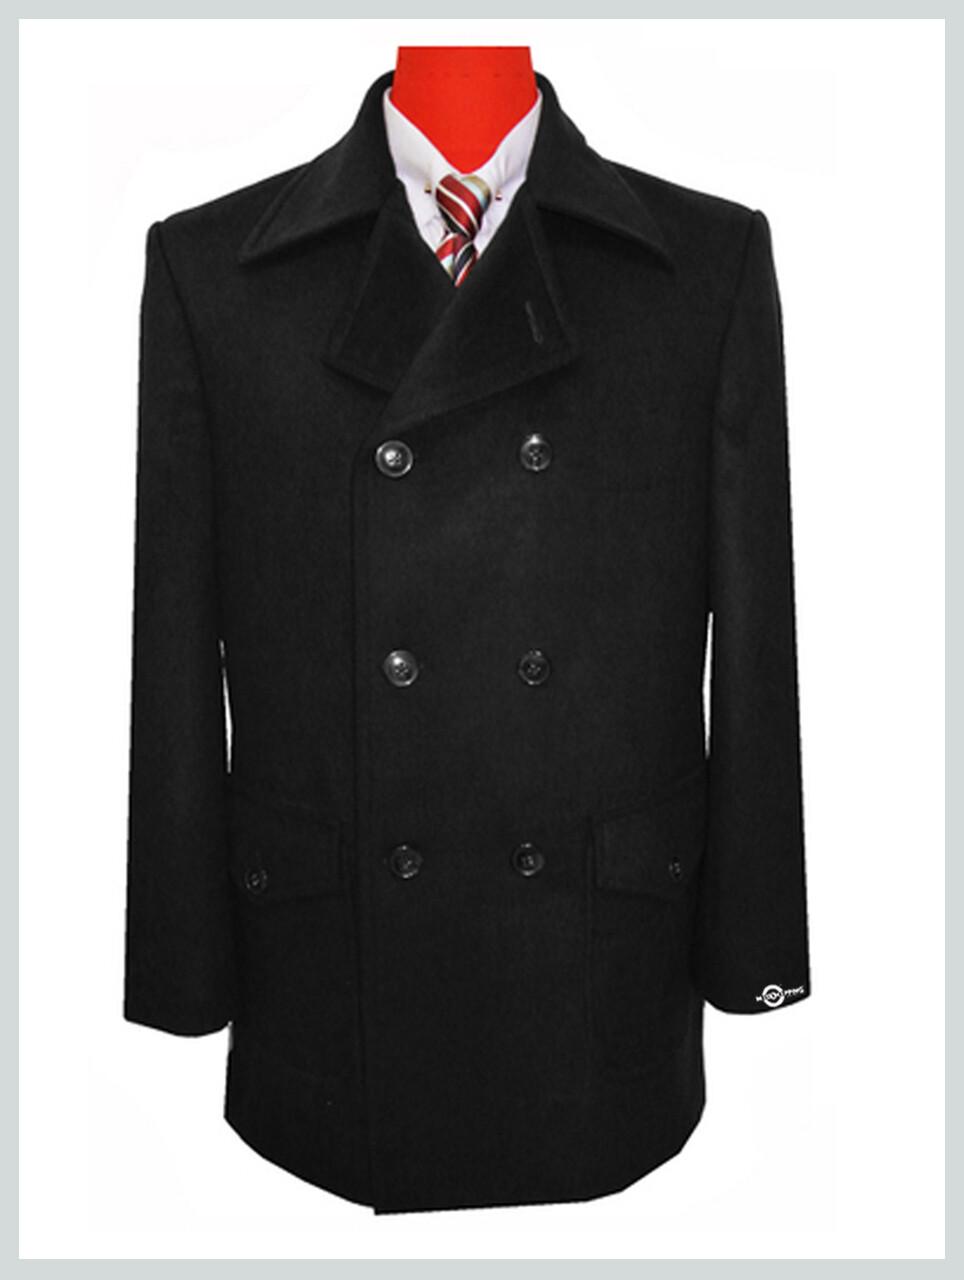 black pea coat| 60s mod reto mens black pea coat for winter